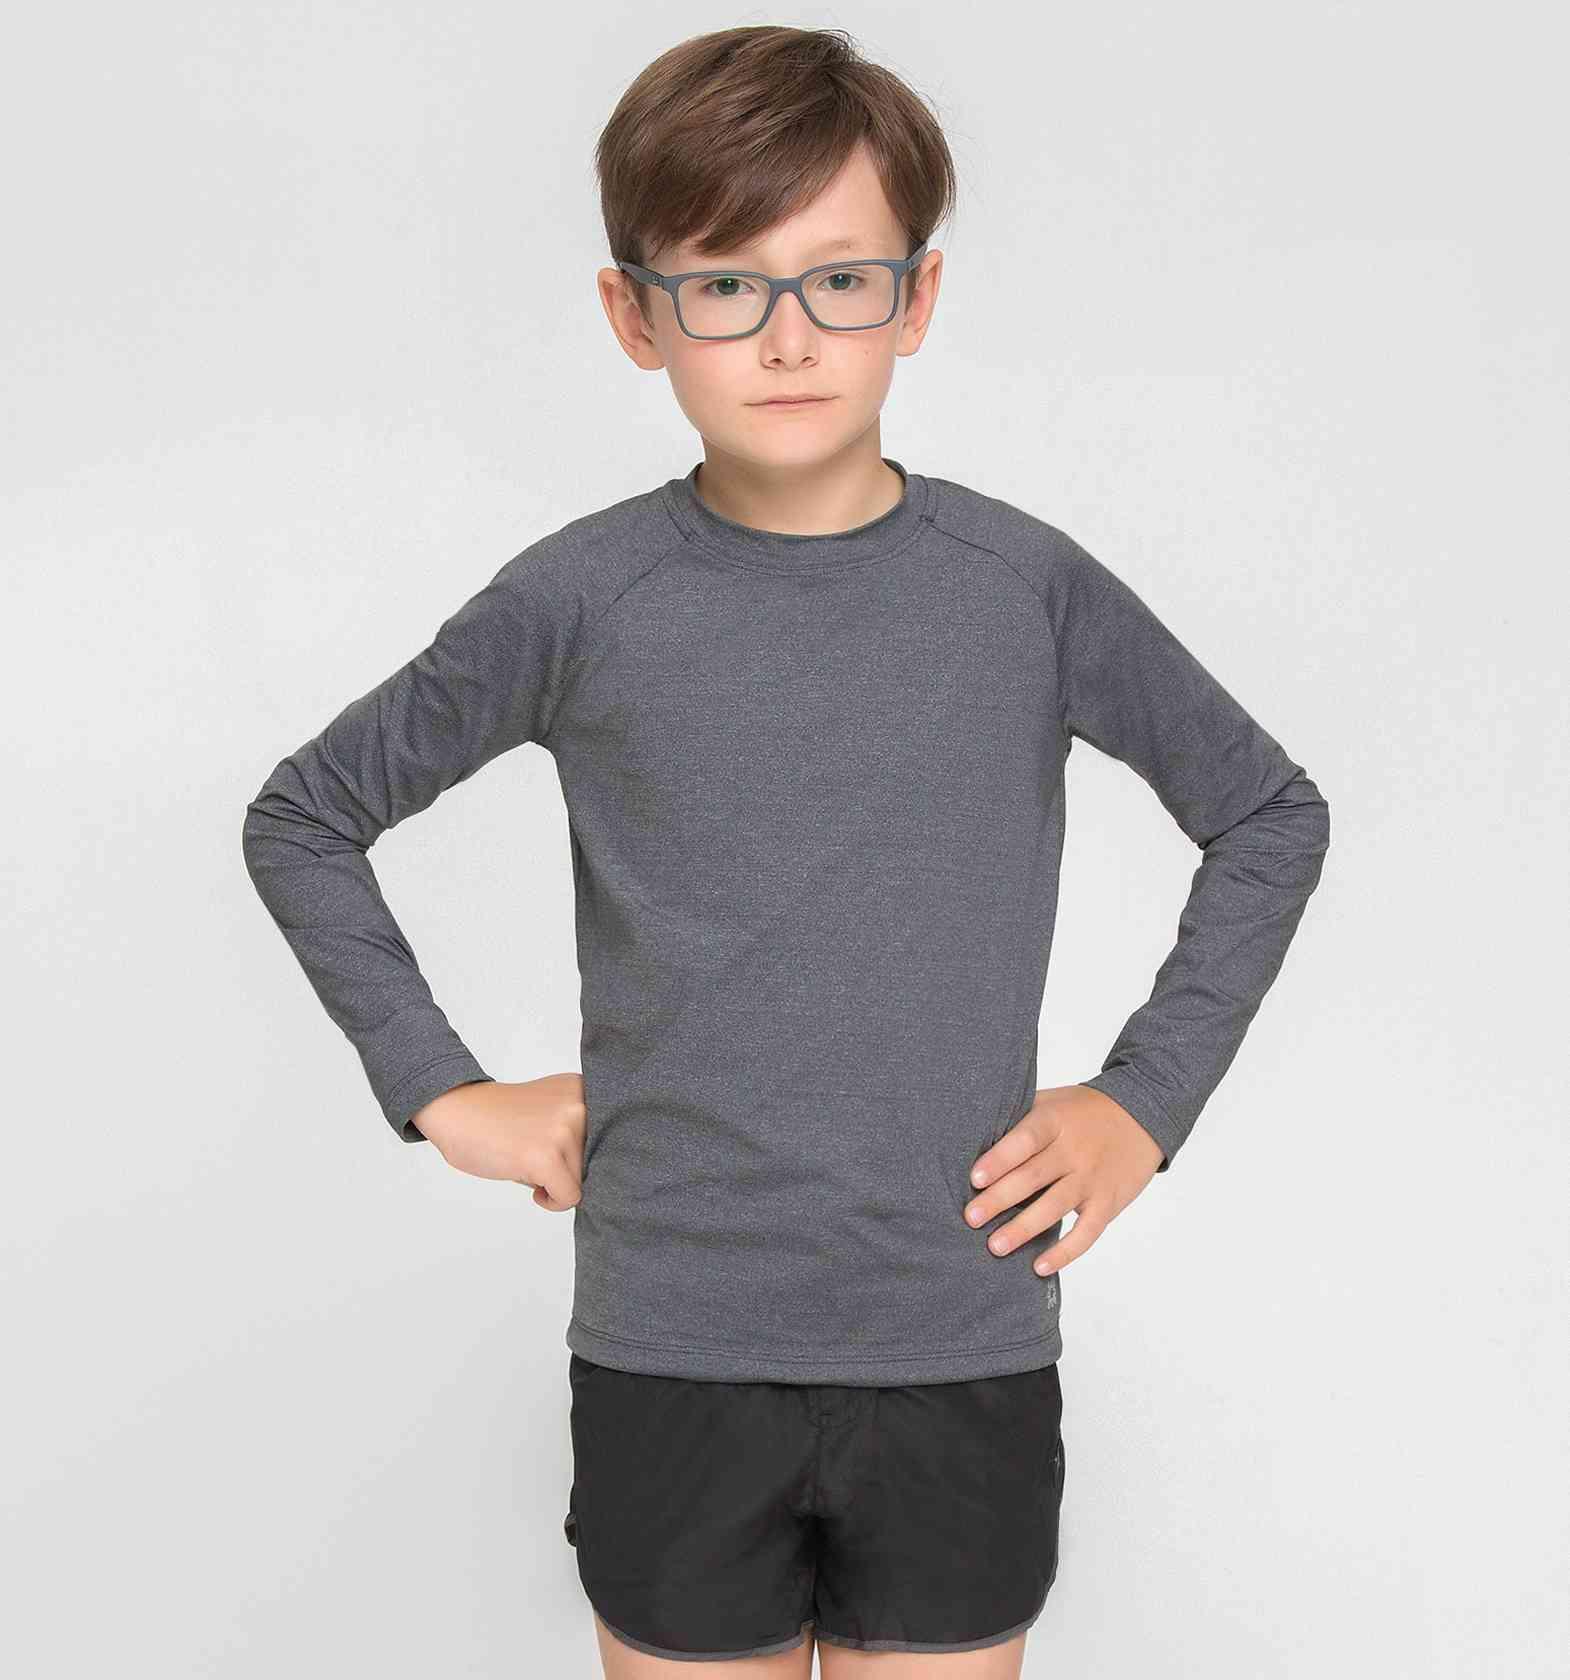 UV LINE Camiseta Uvpro Infantil Manga Longa Cinza Proteção Solar